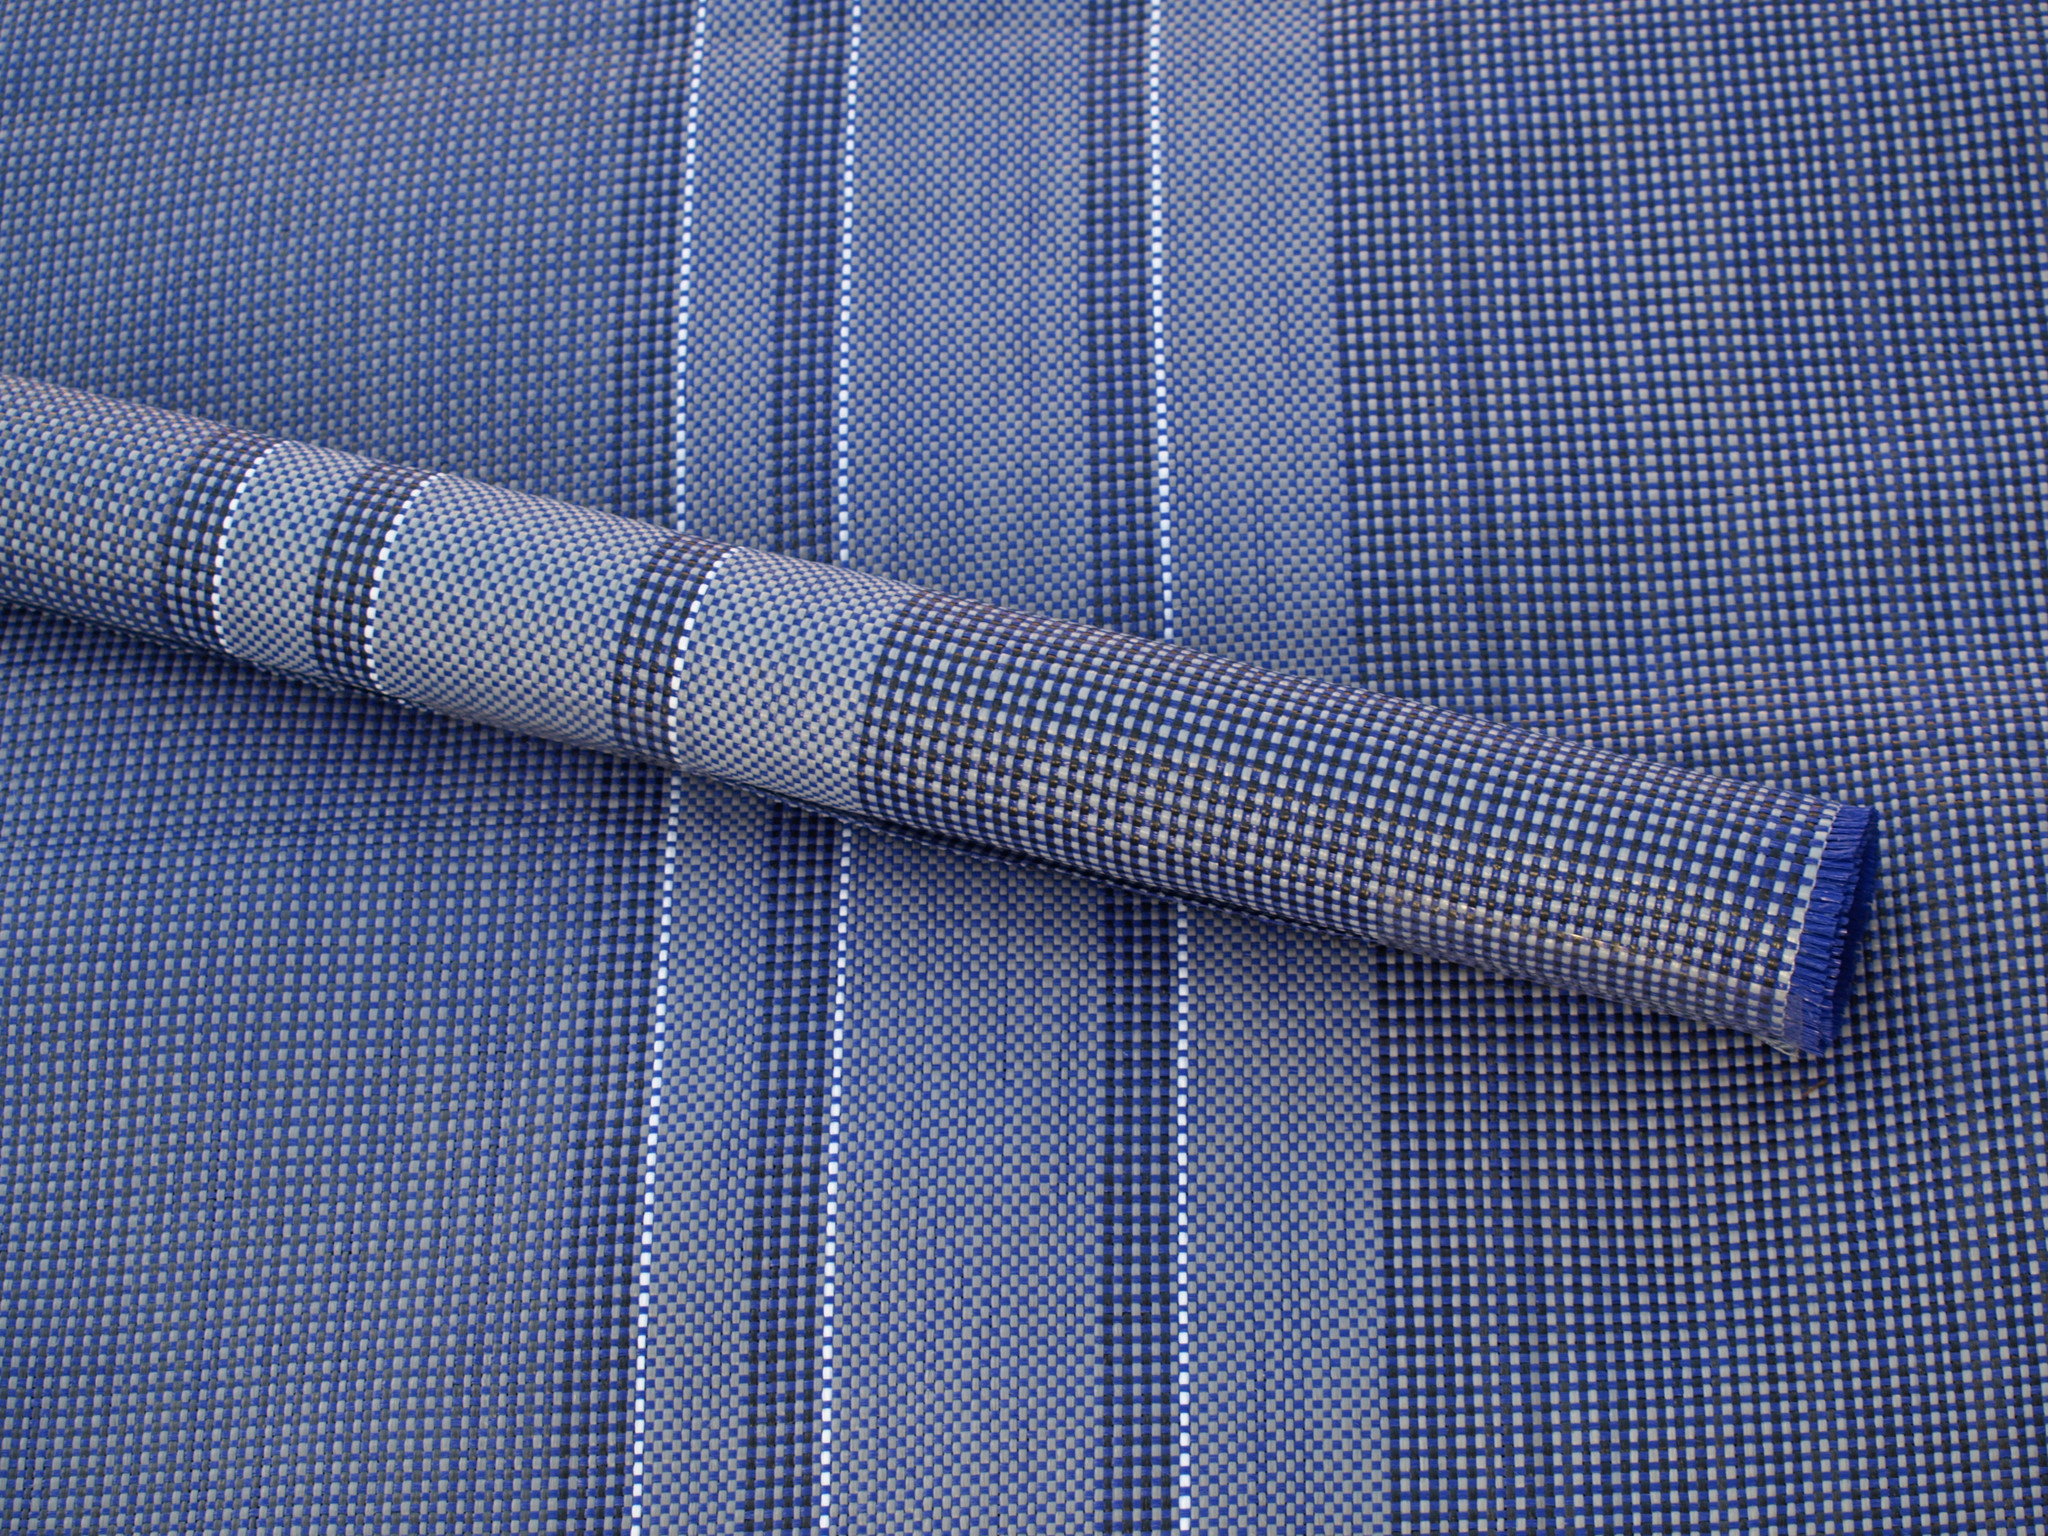 Arisol Bleu ray/é 2,5 x 4,5 m/ètres Classic Tapis de tente